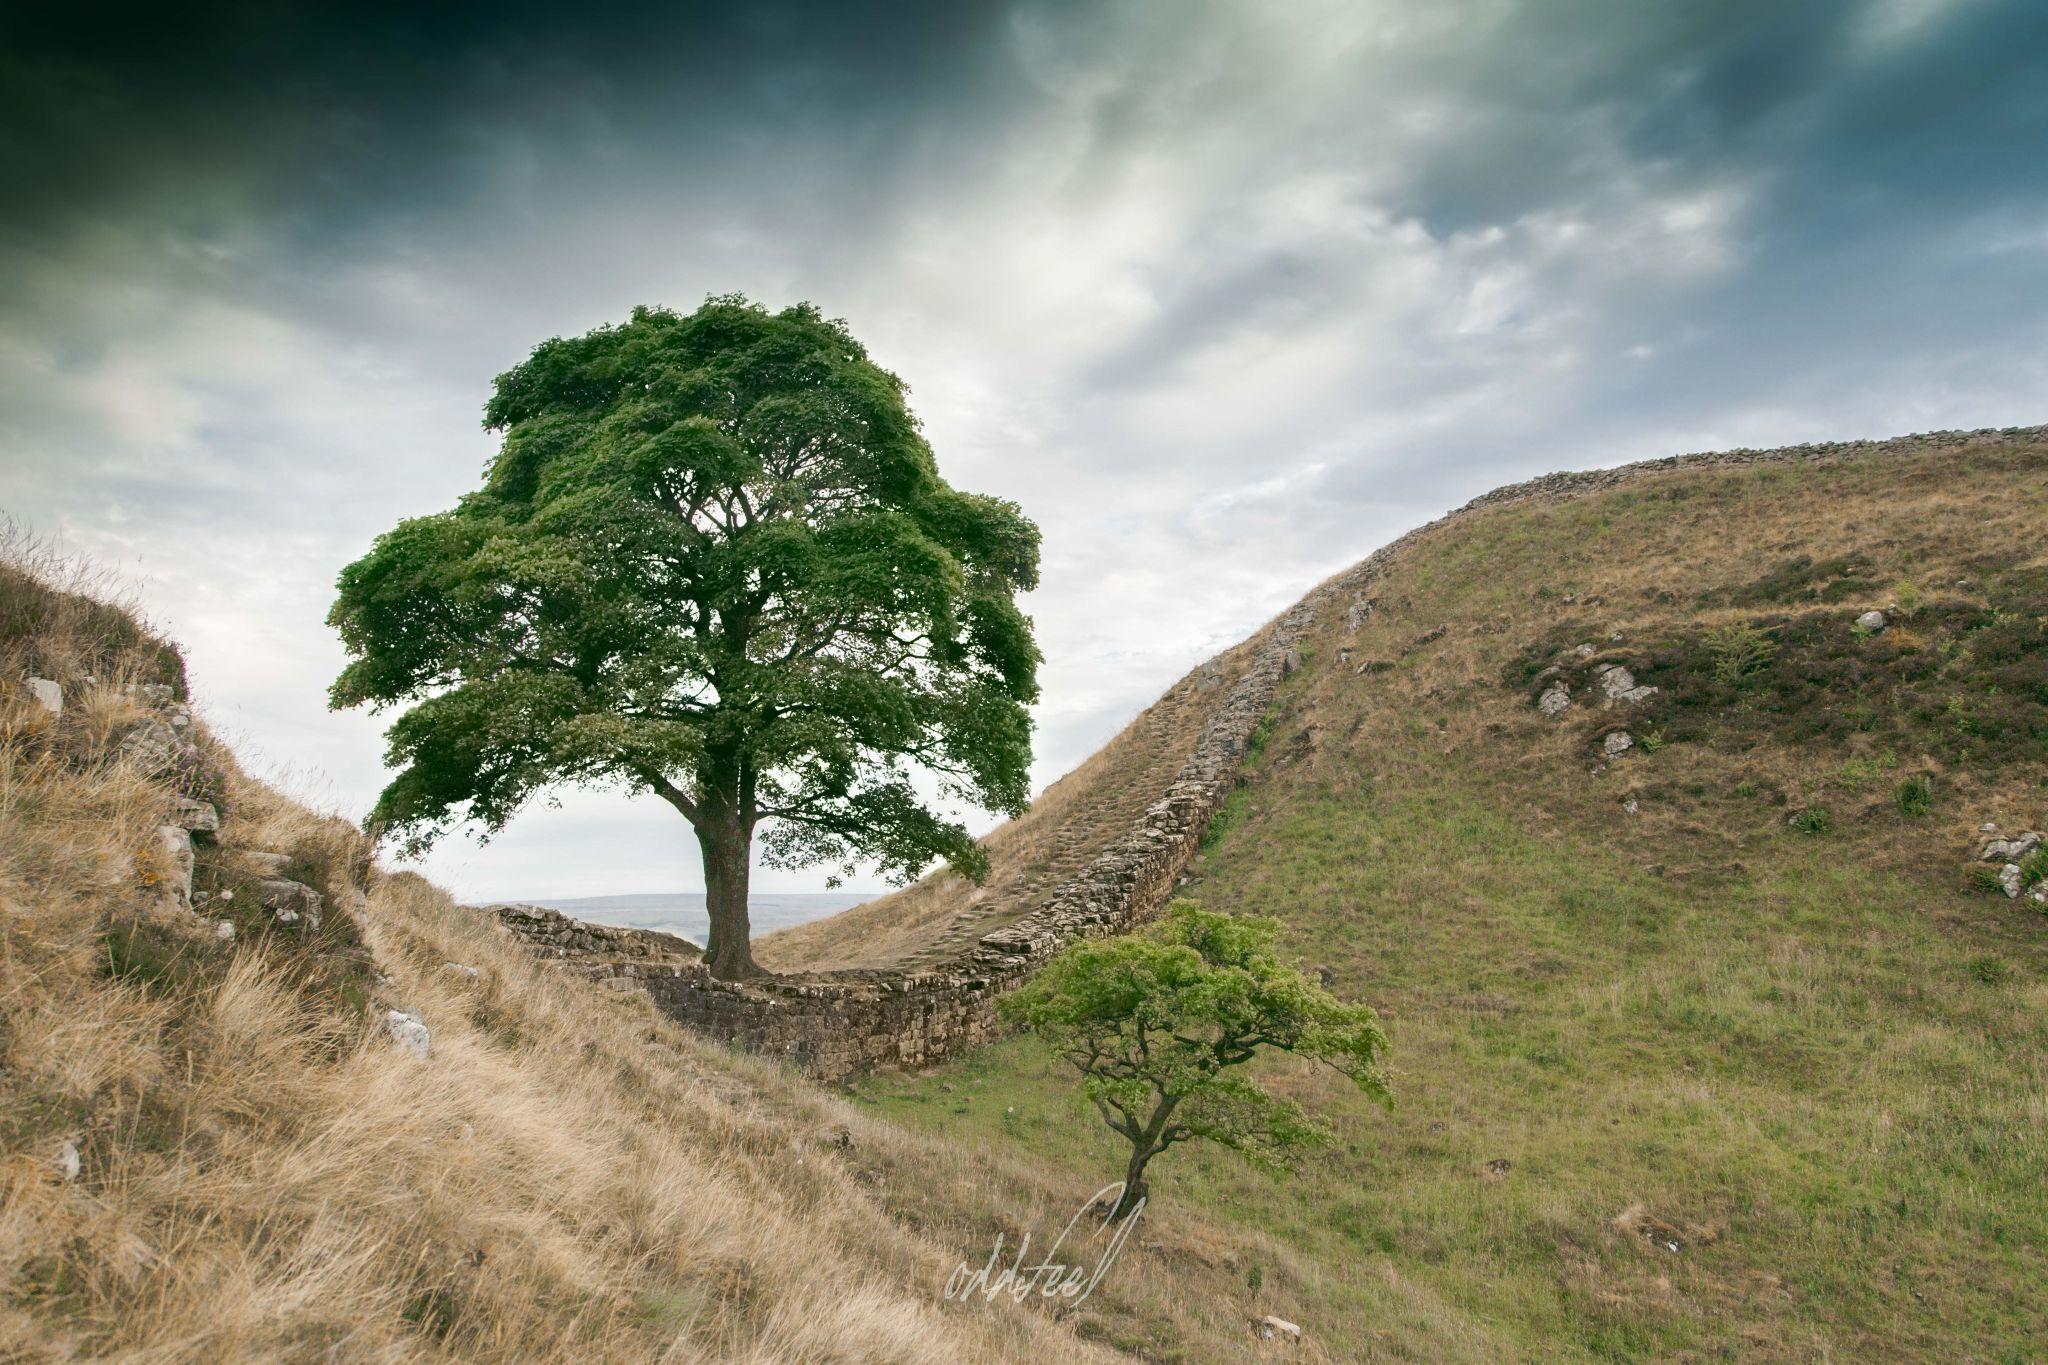 The Sycamore Gap Tree, United Kingdom